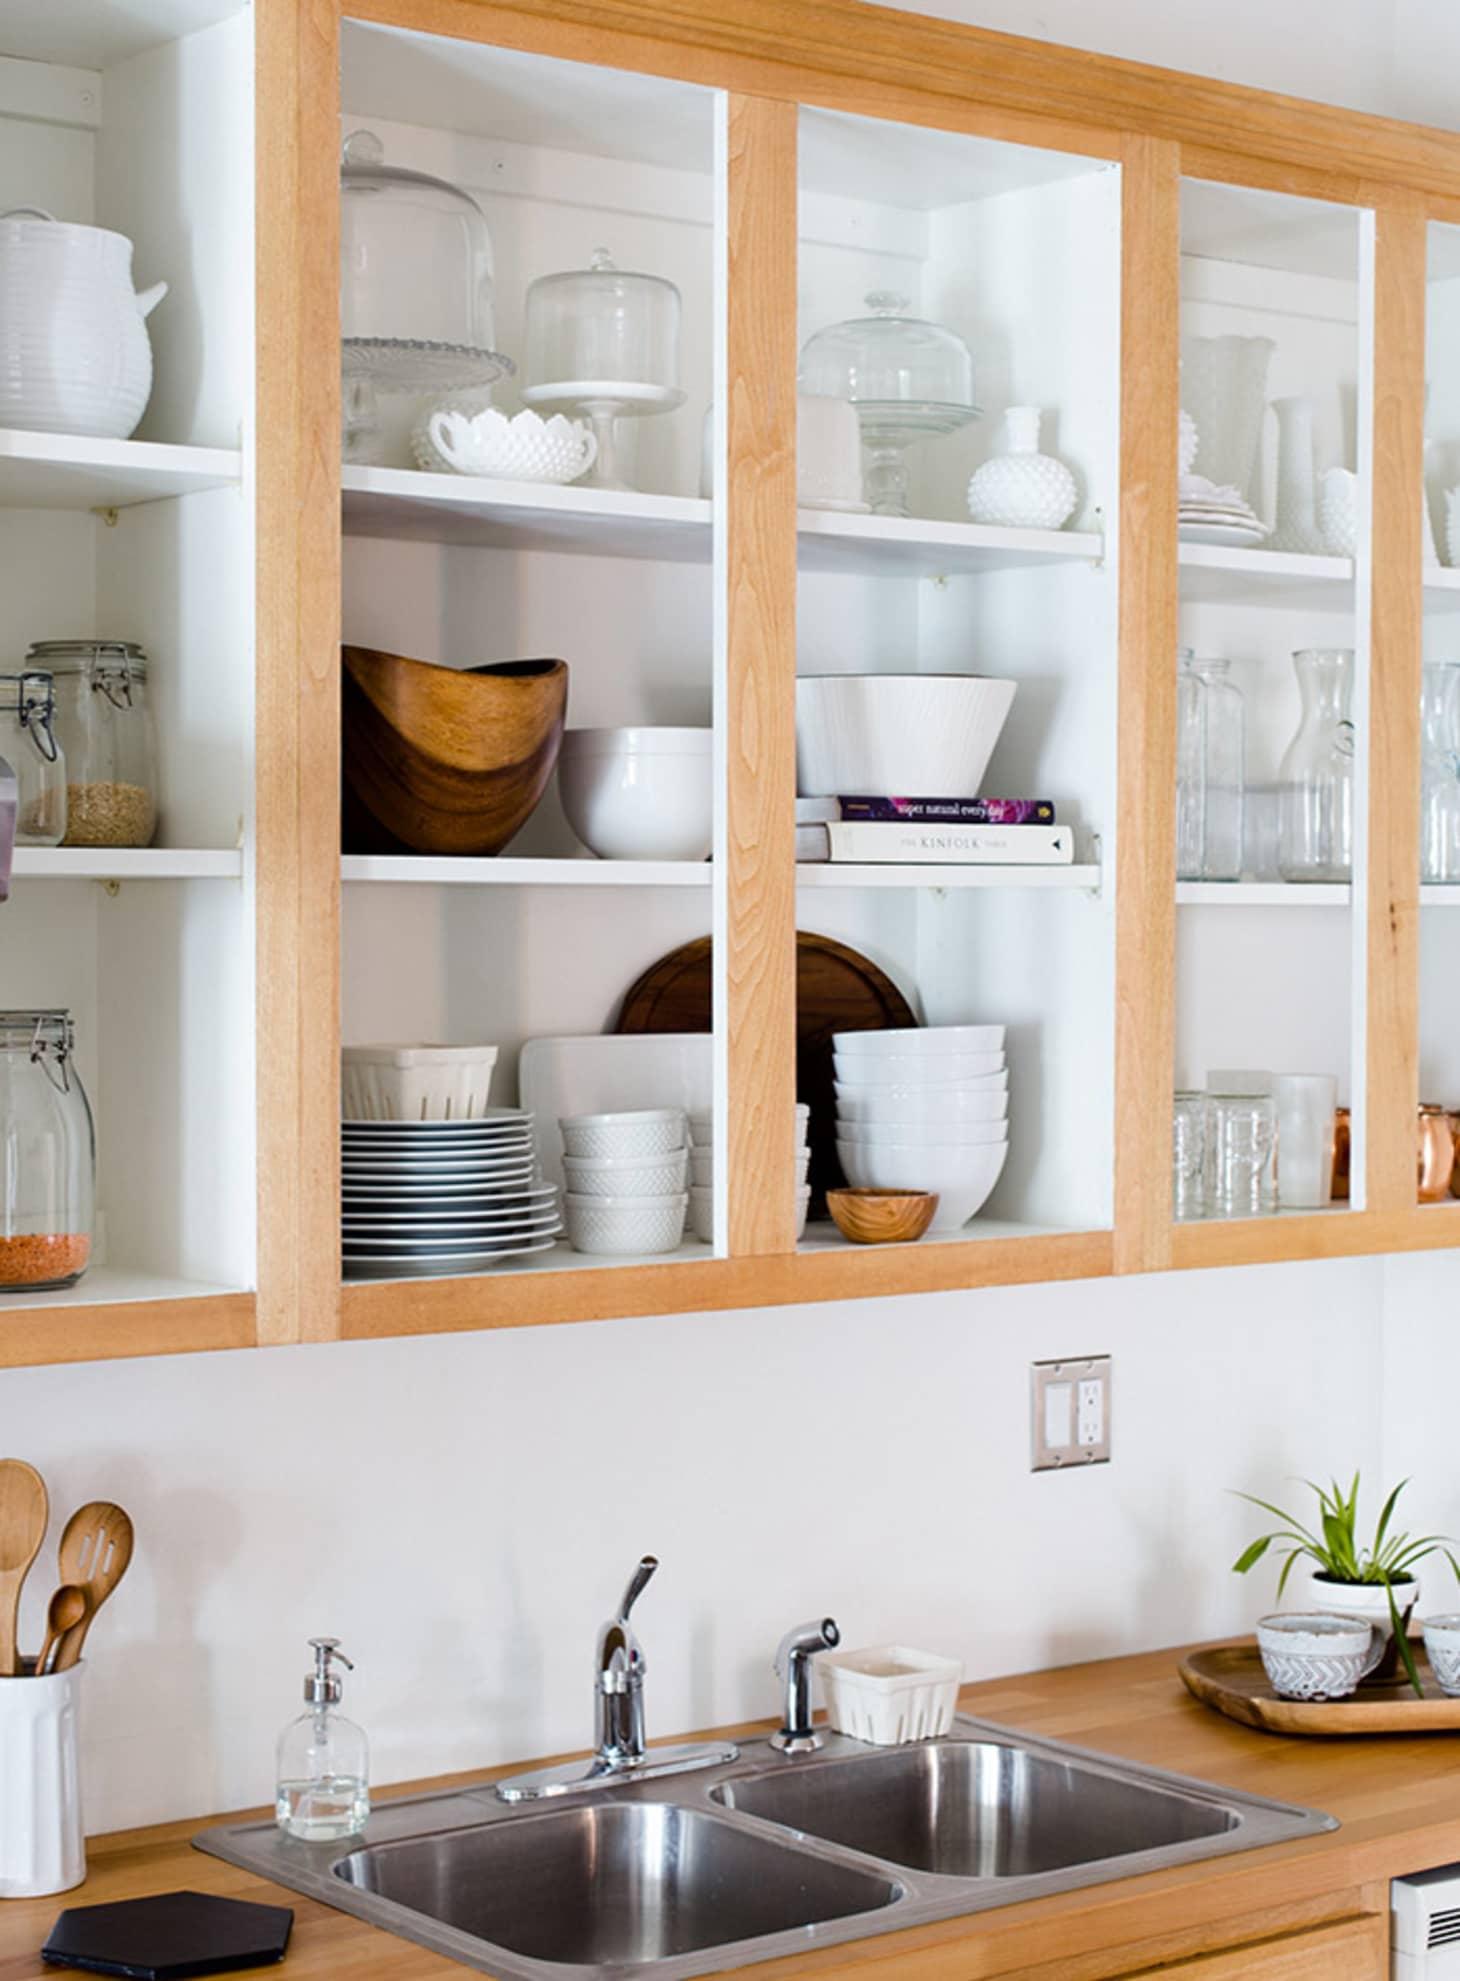 Rental Kitchen Decor Ideas Oak Wood Finish Cabinets